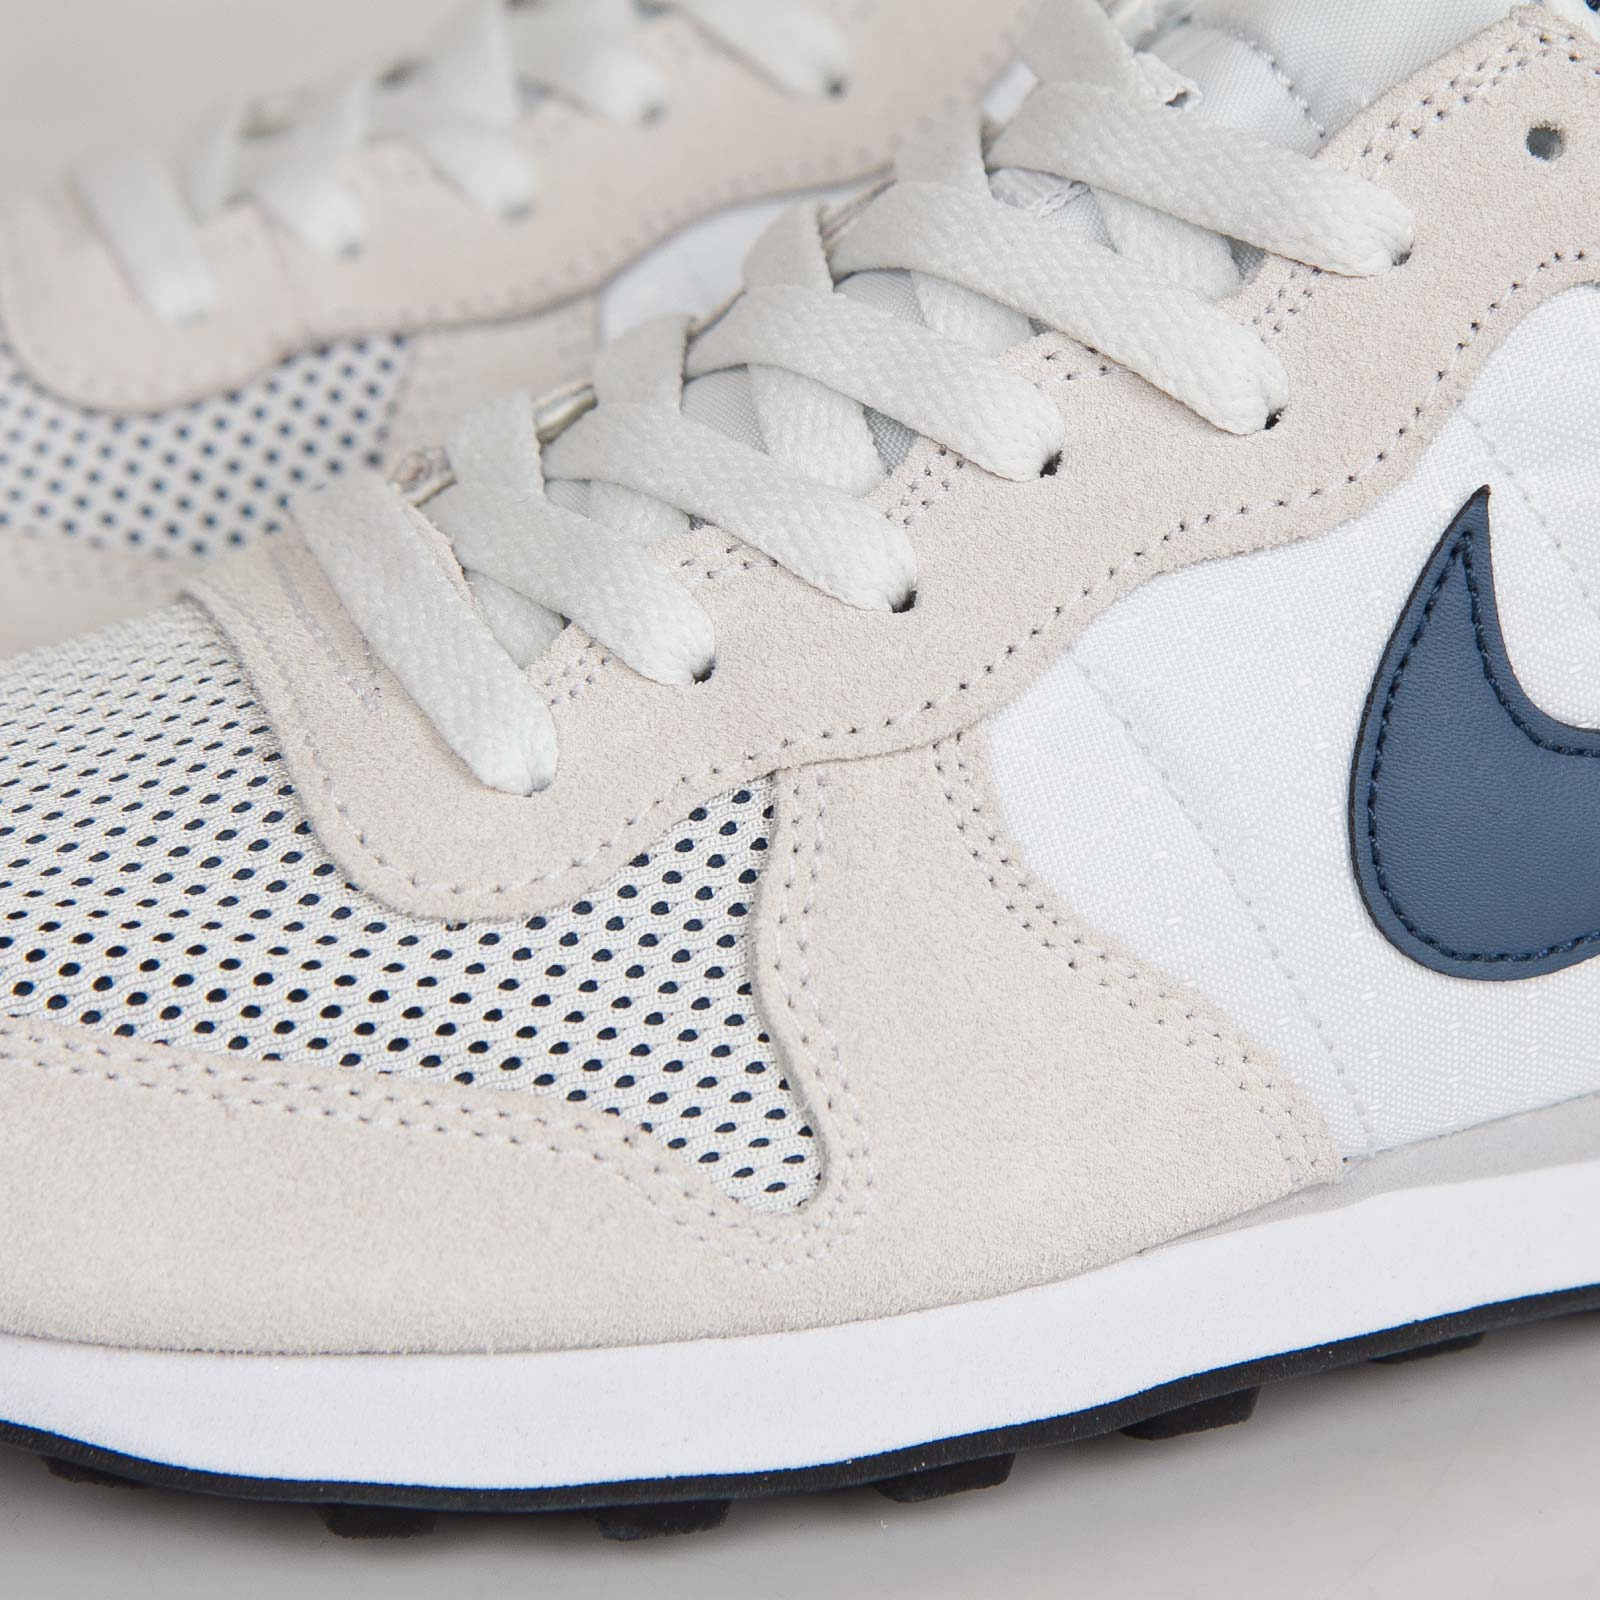 Nike Internationalist Nike Internationalist Nike Internationalist Nike  Internationalist Nike Internationalist Nike Internationalist 61b9bd144